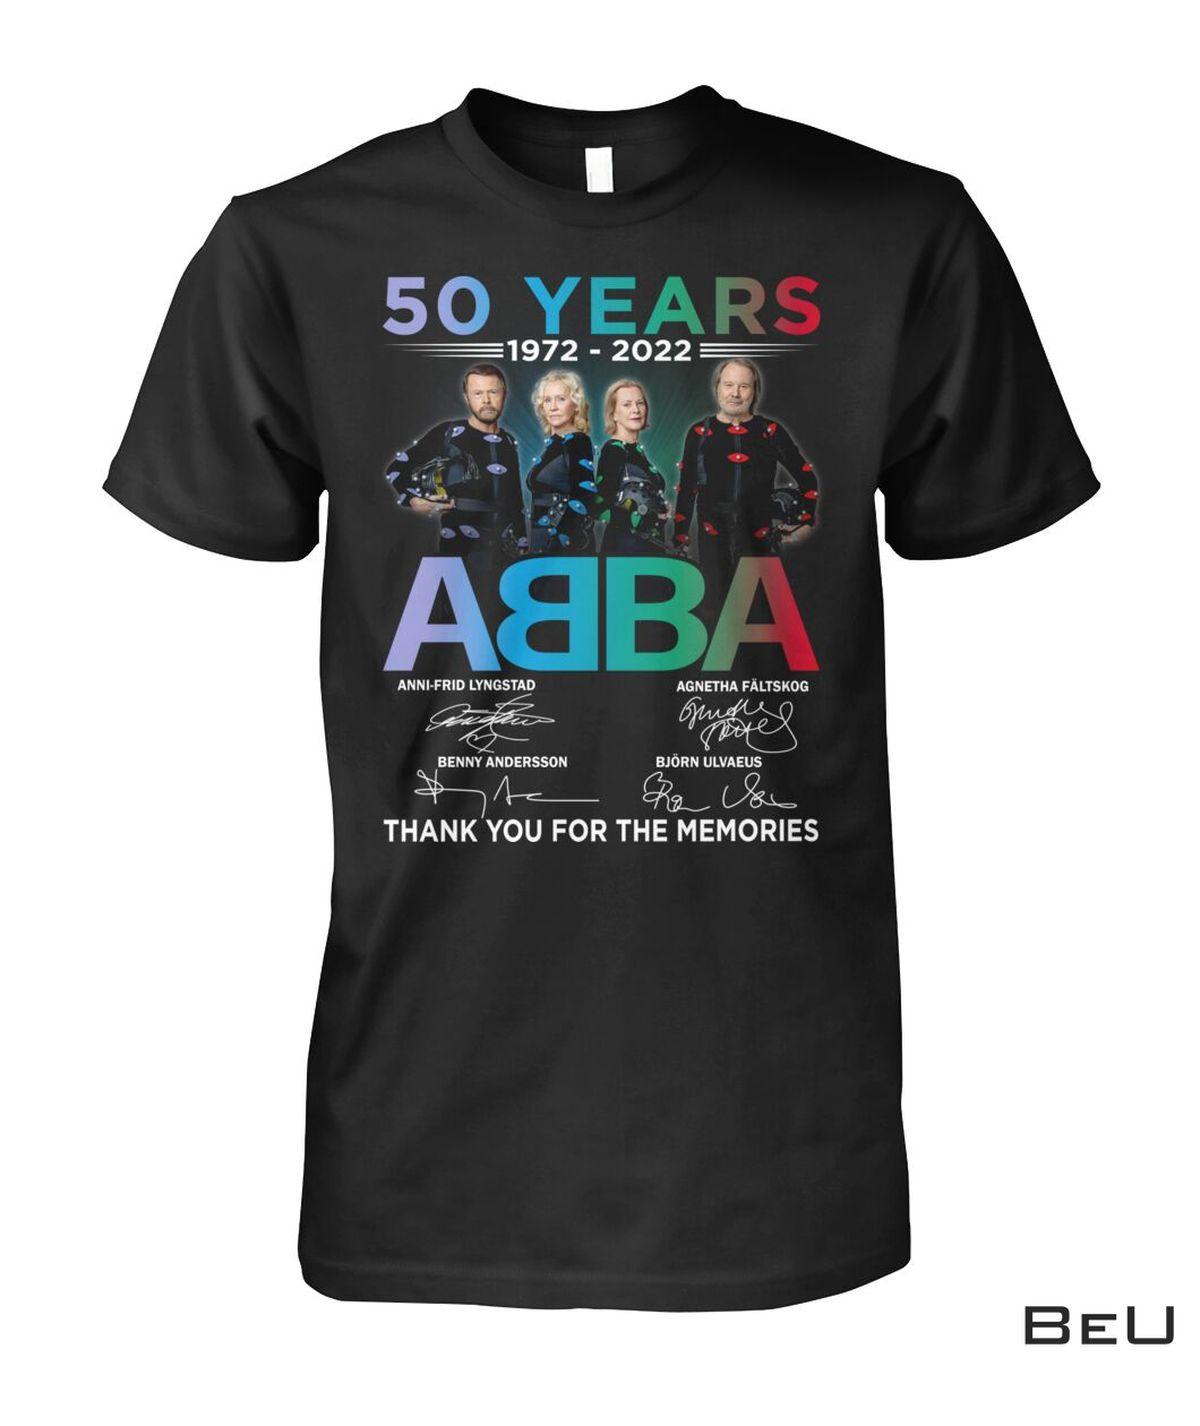 50 Years Of Abba 1972-2022 Shirt, hoodie, tank top